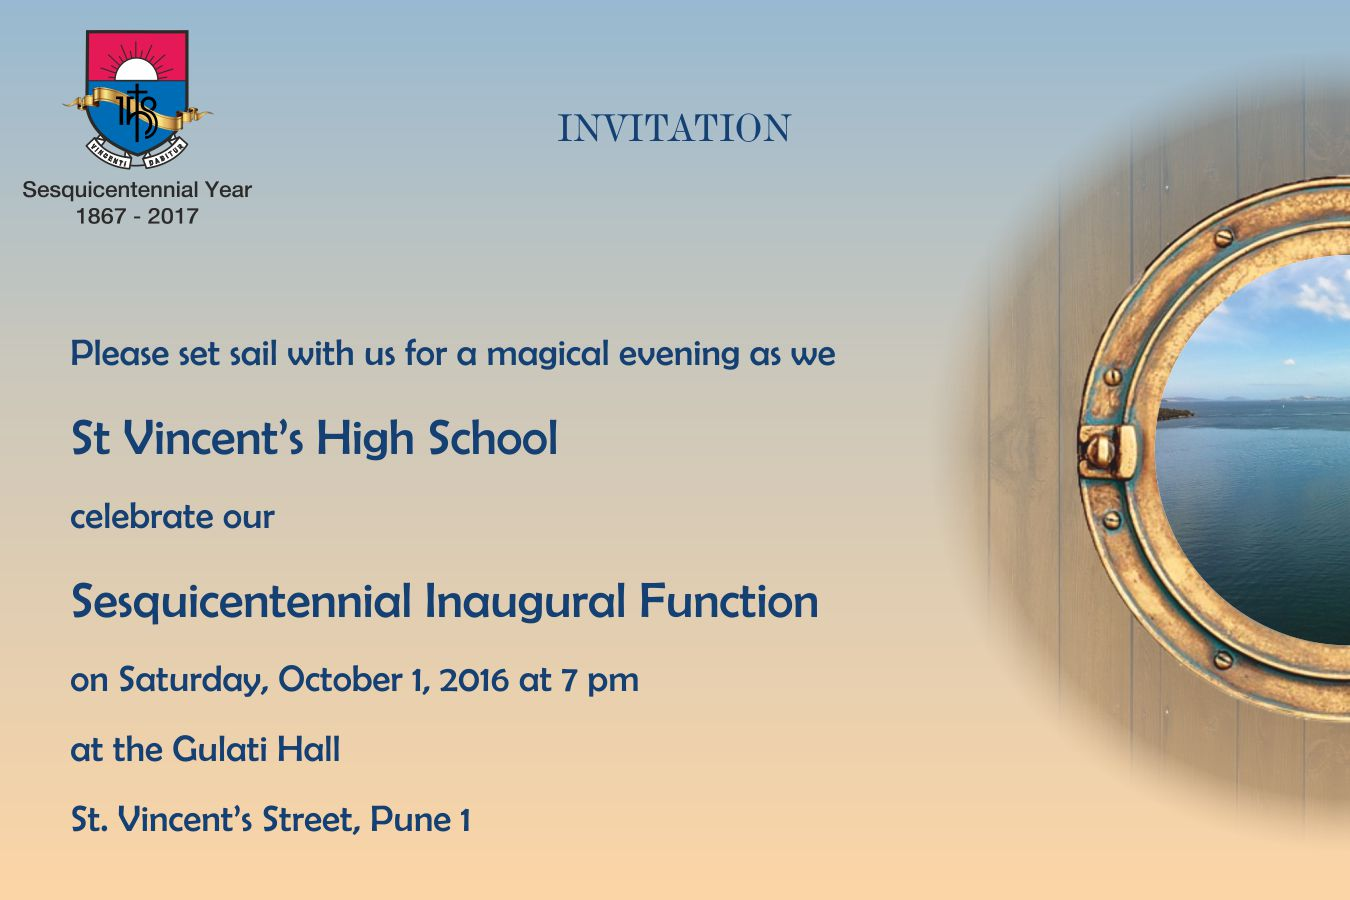 Invitation - Inaugural Function